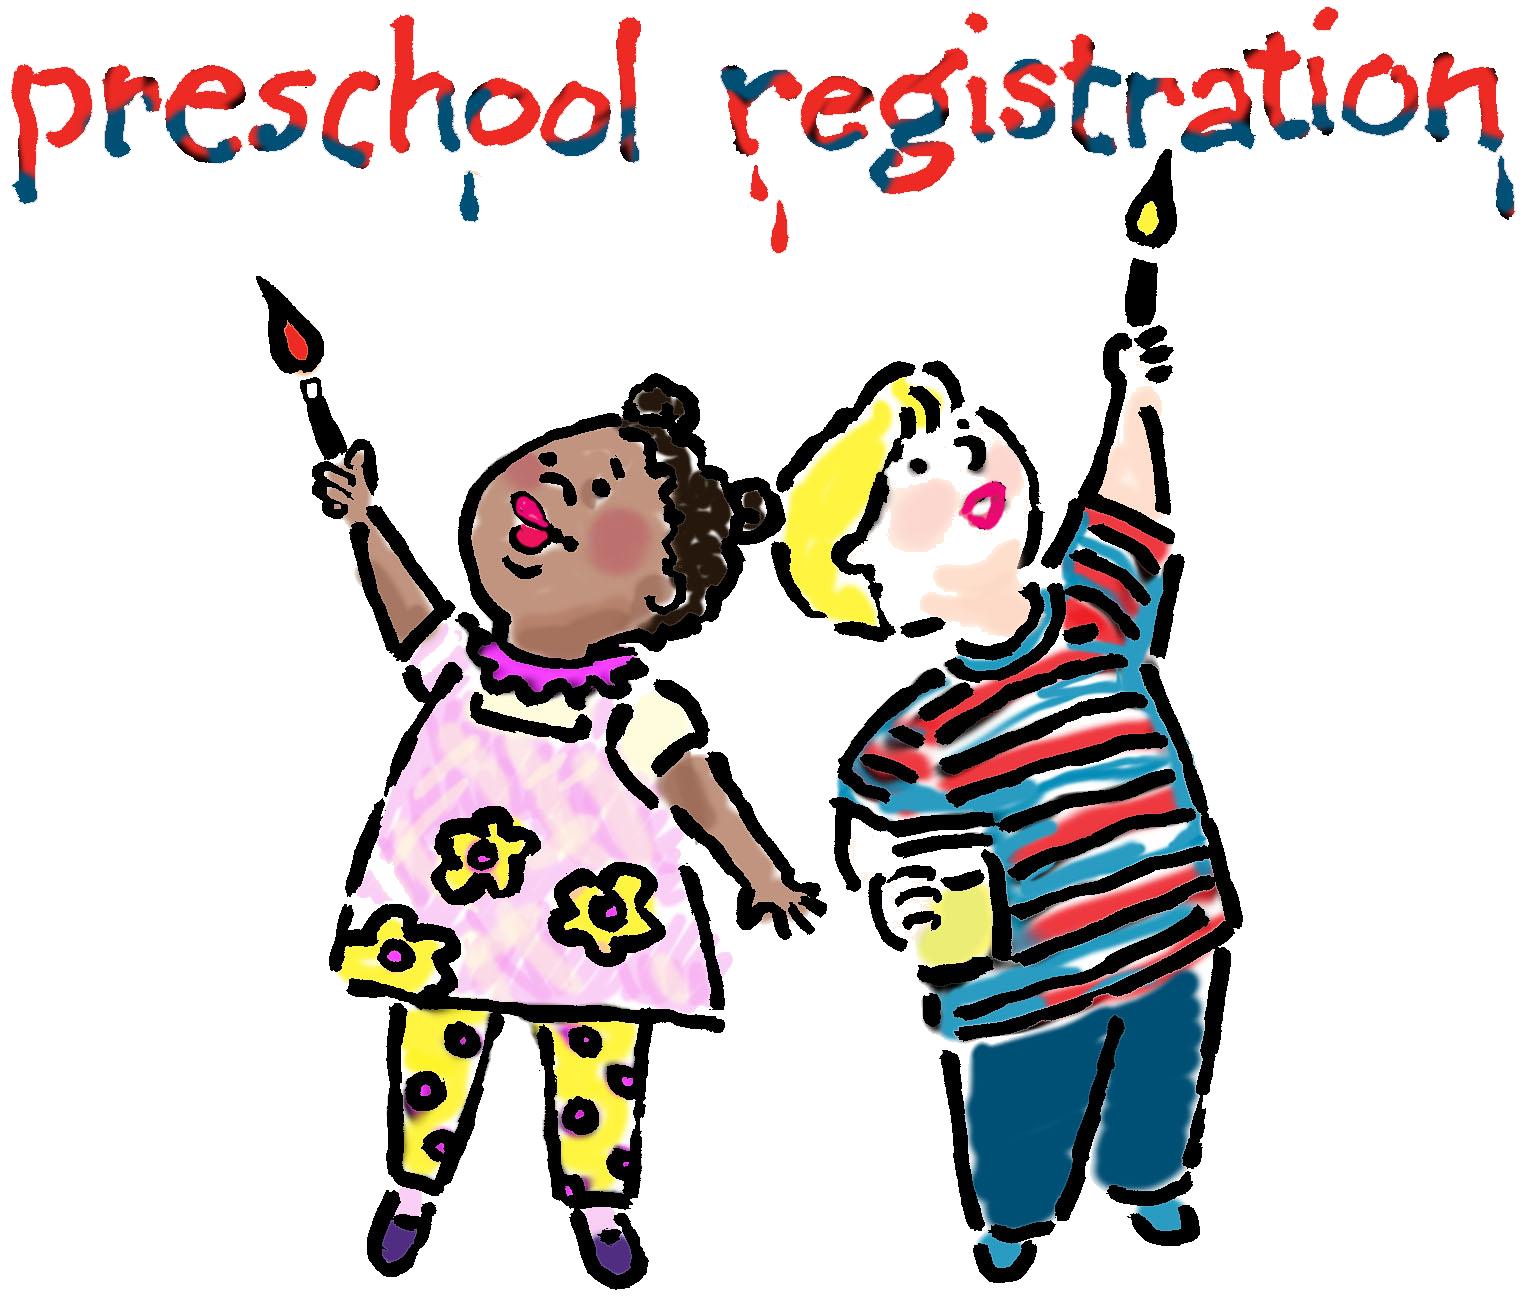 picture freeuse library Registration . Announcements clipart preschool.